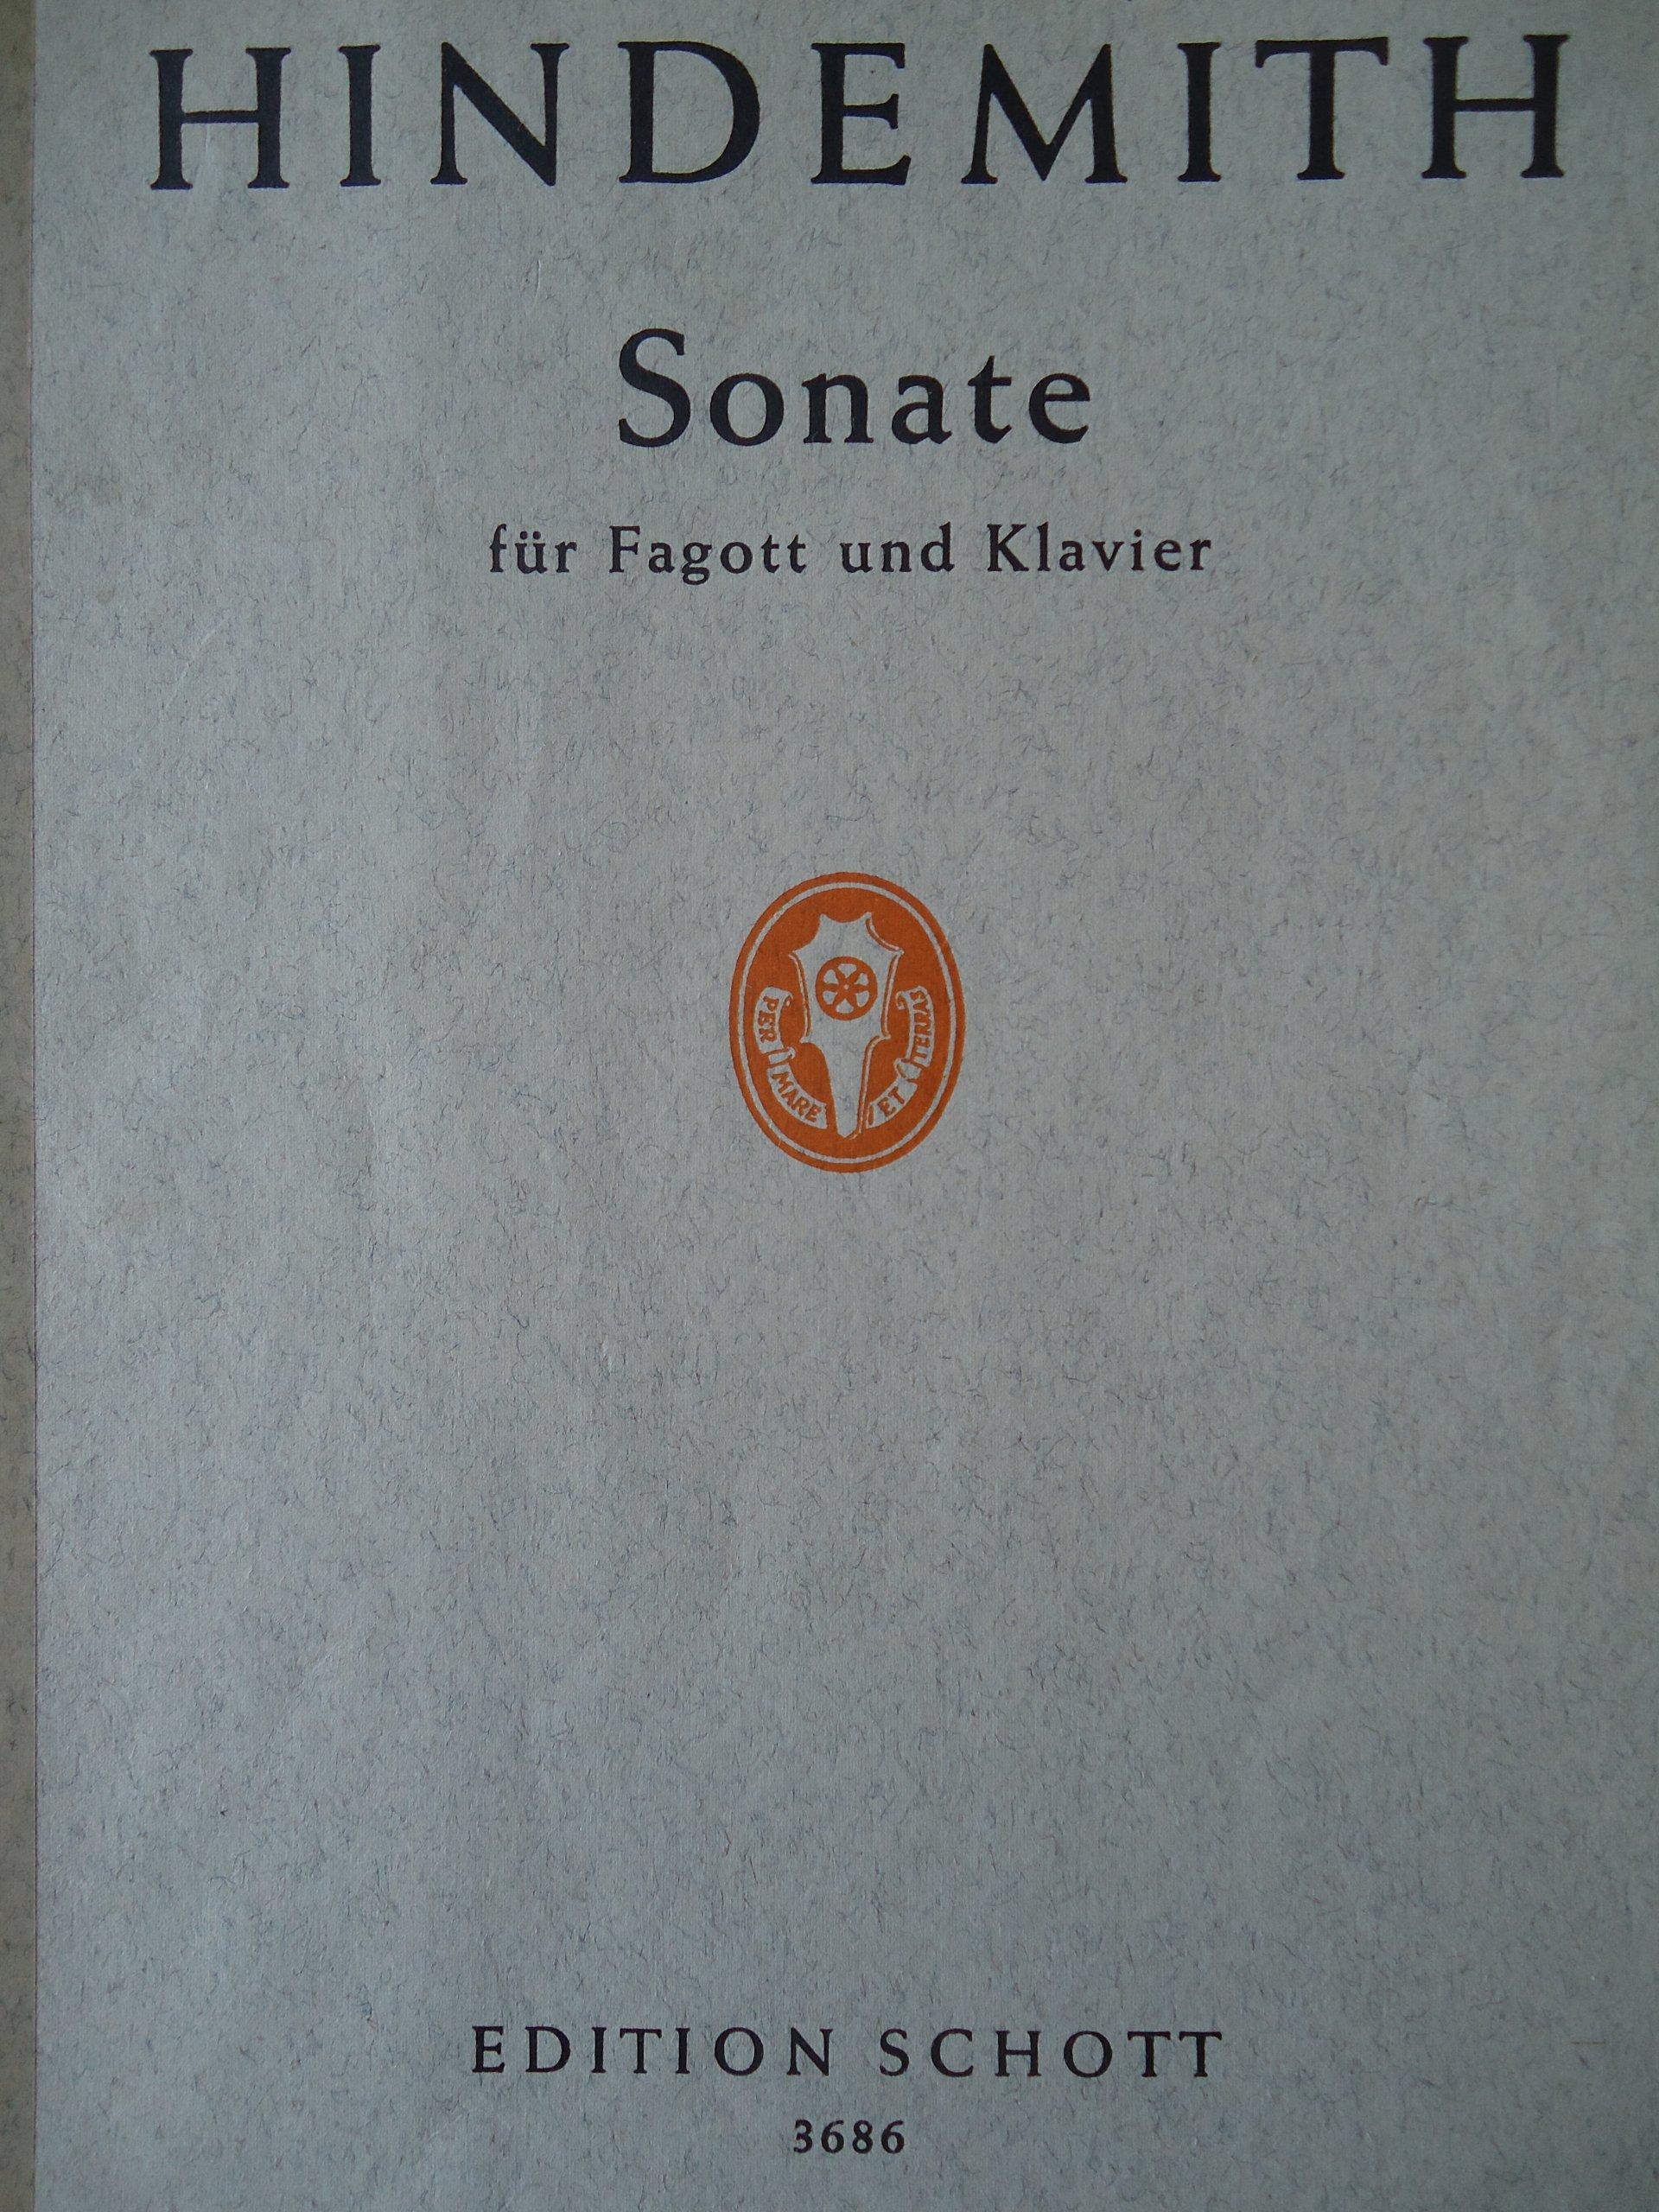 Sonate fur Fagott und Klavier (Sonata for Bassoon & Piano)